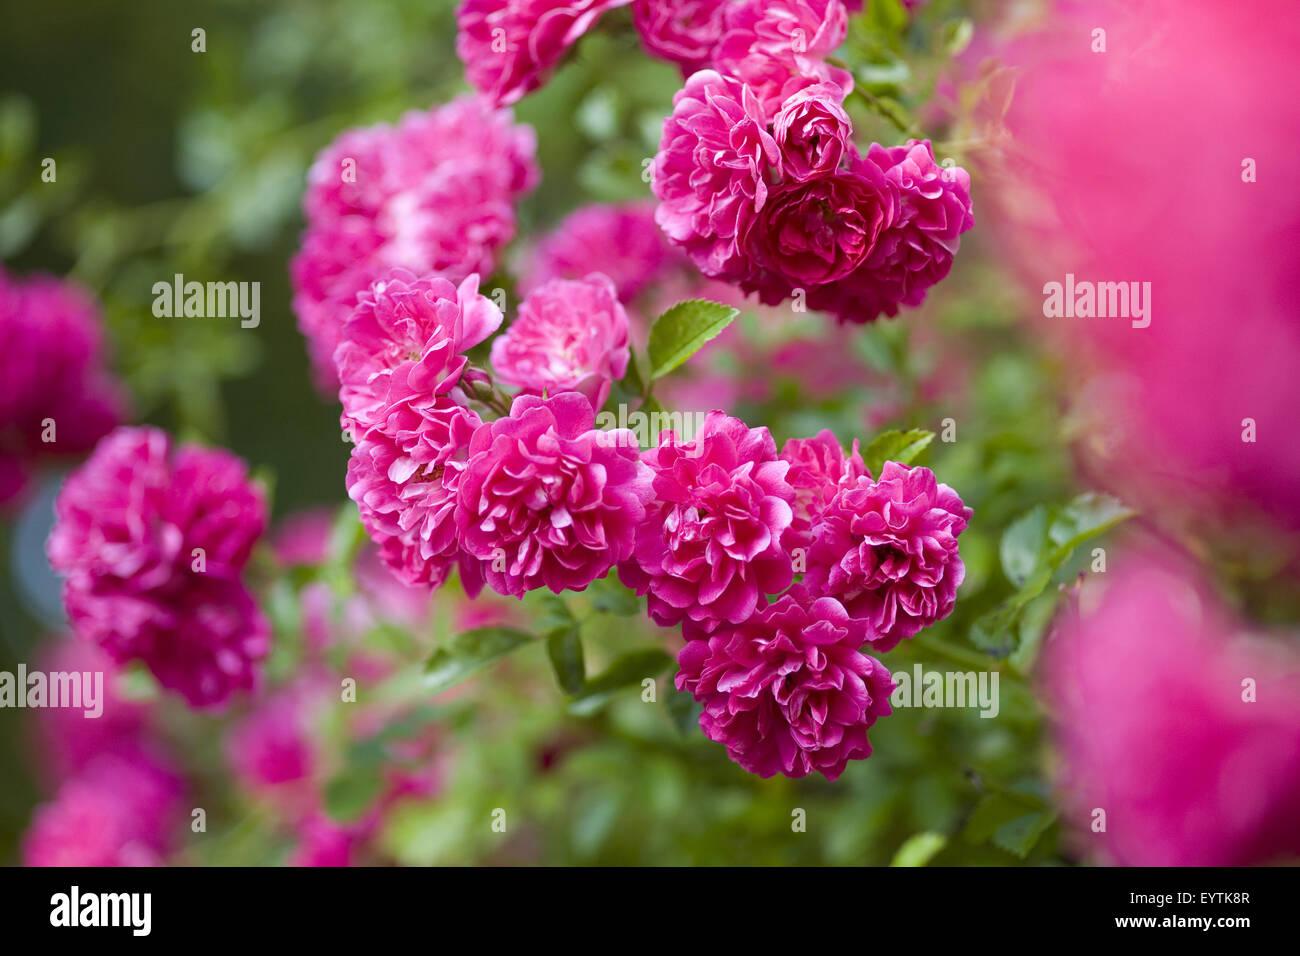 magenta coloured rosebush - Stock Image